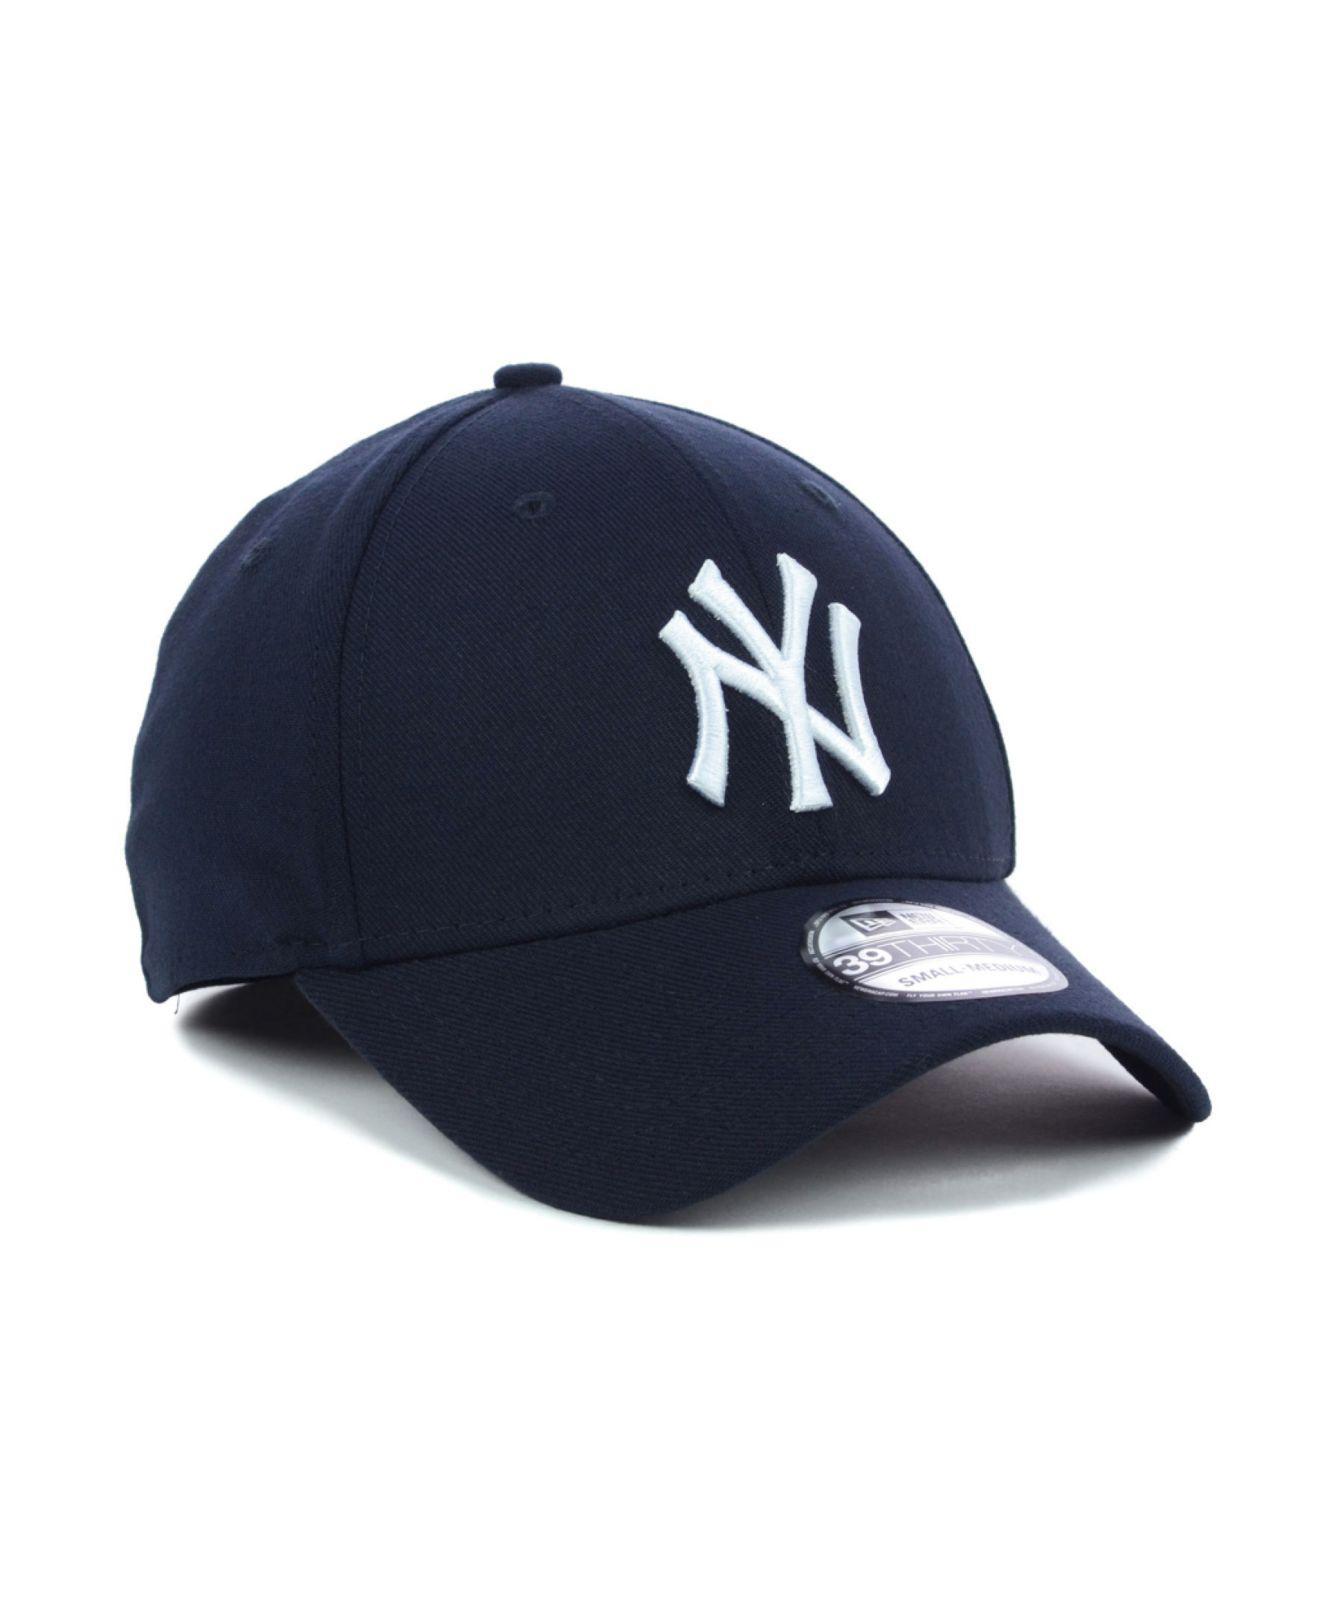 huge discount 3c8e5 00538 ... coupon for new york yankees mlb team classic 39thirty cap for men lyst.  view fullscreen